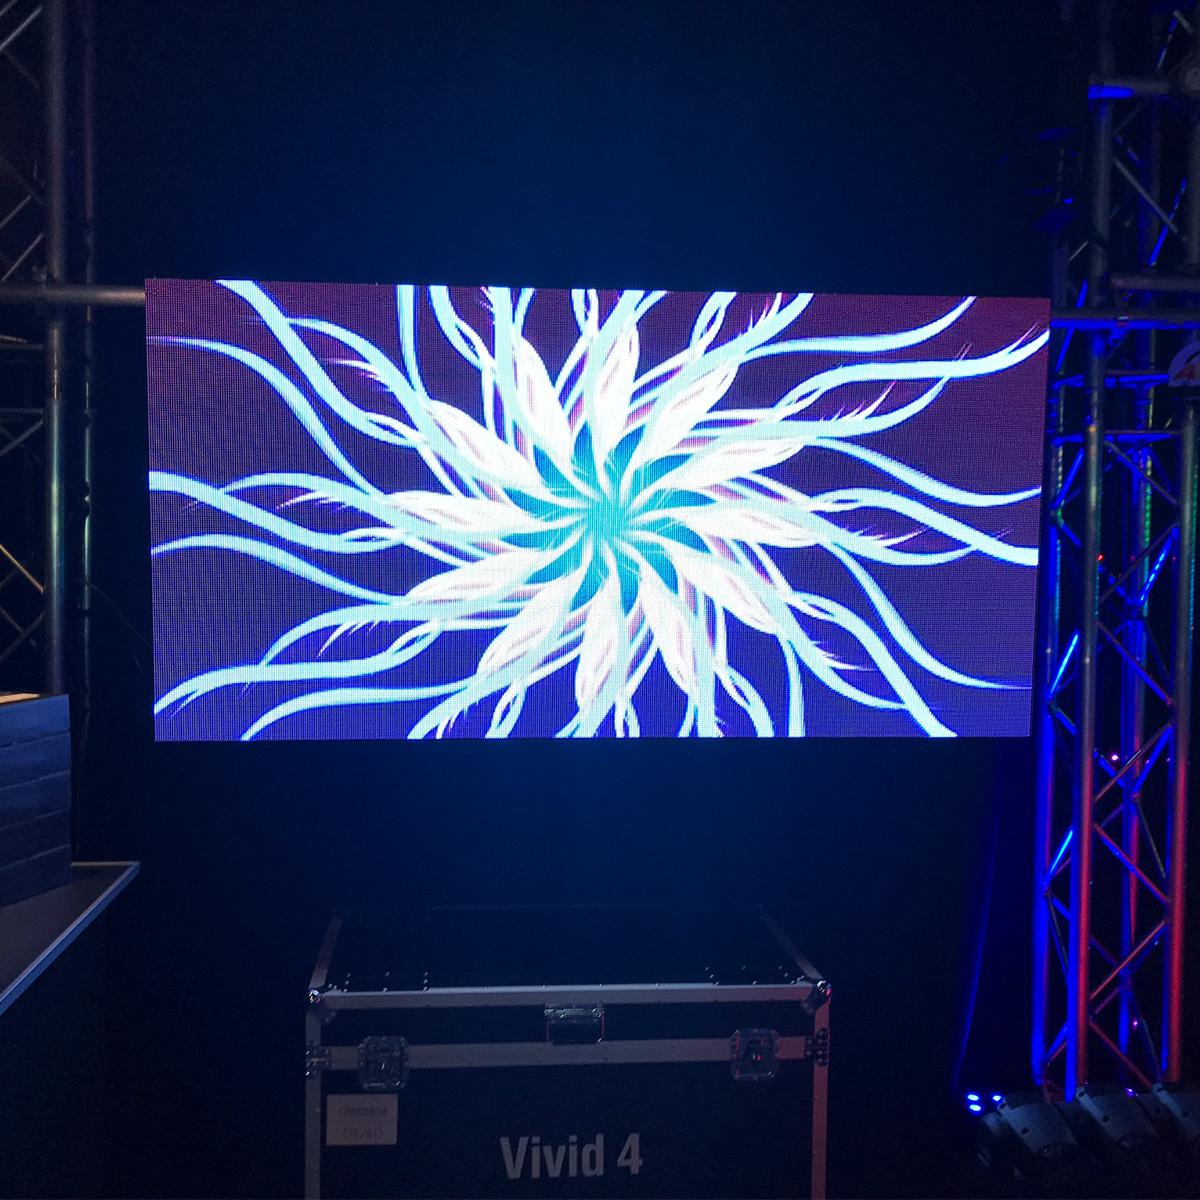 Chauvet Vivid 4 Modular Video Panel